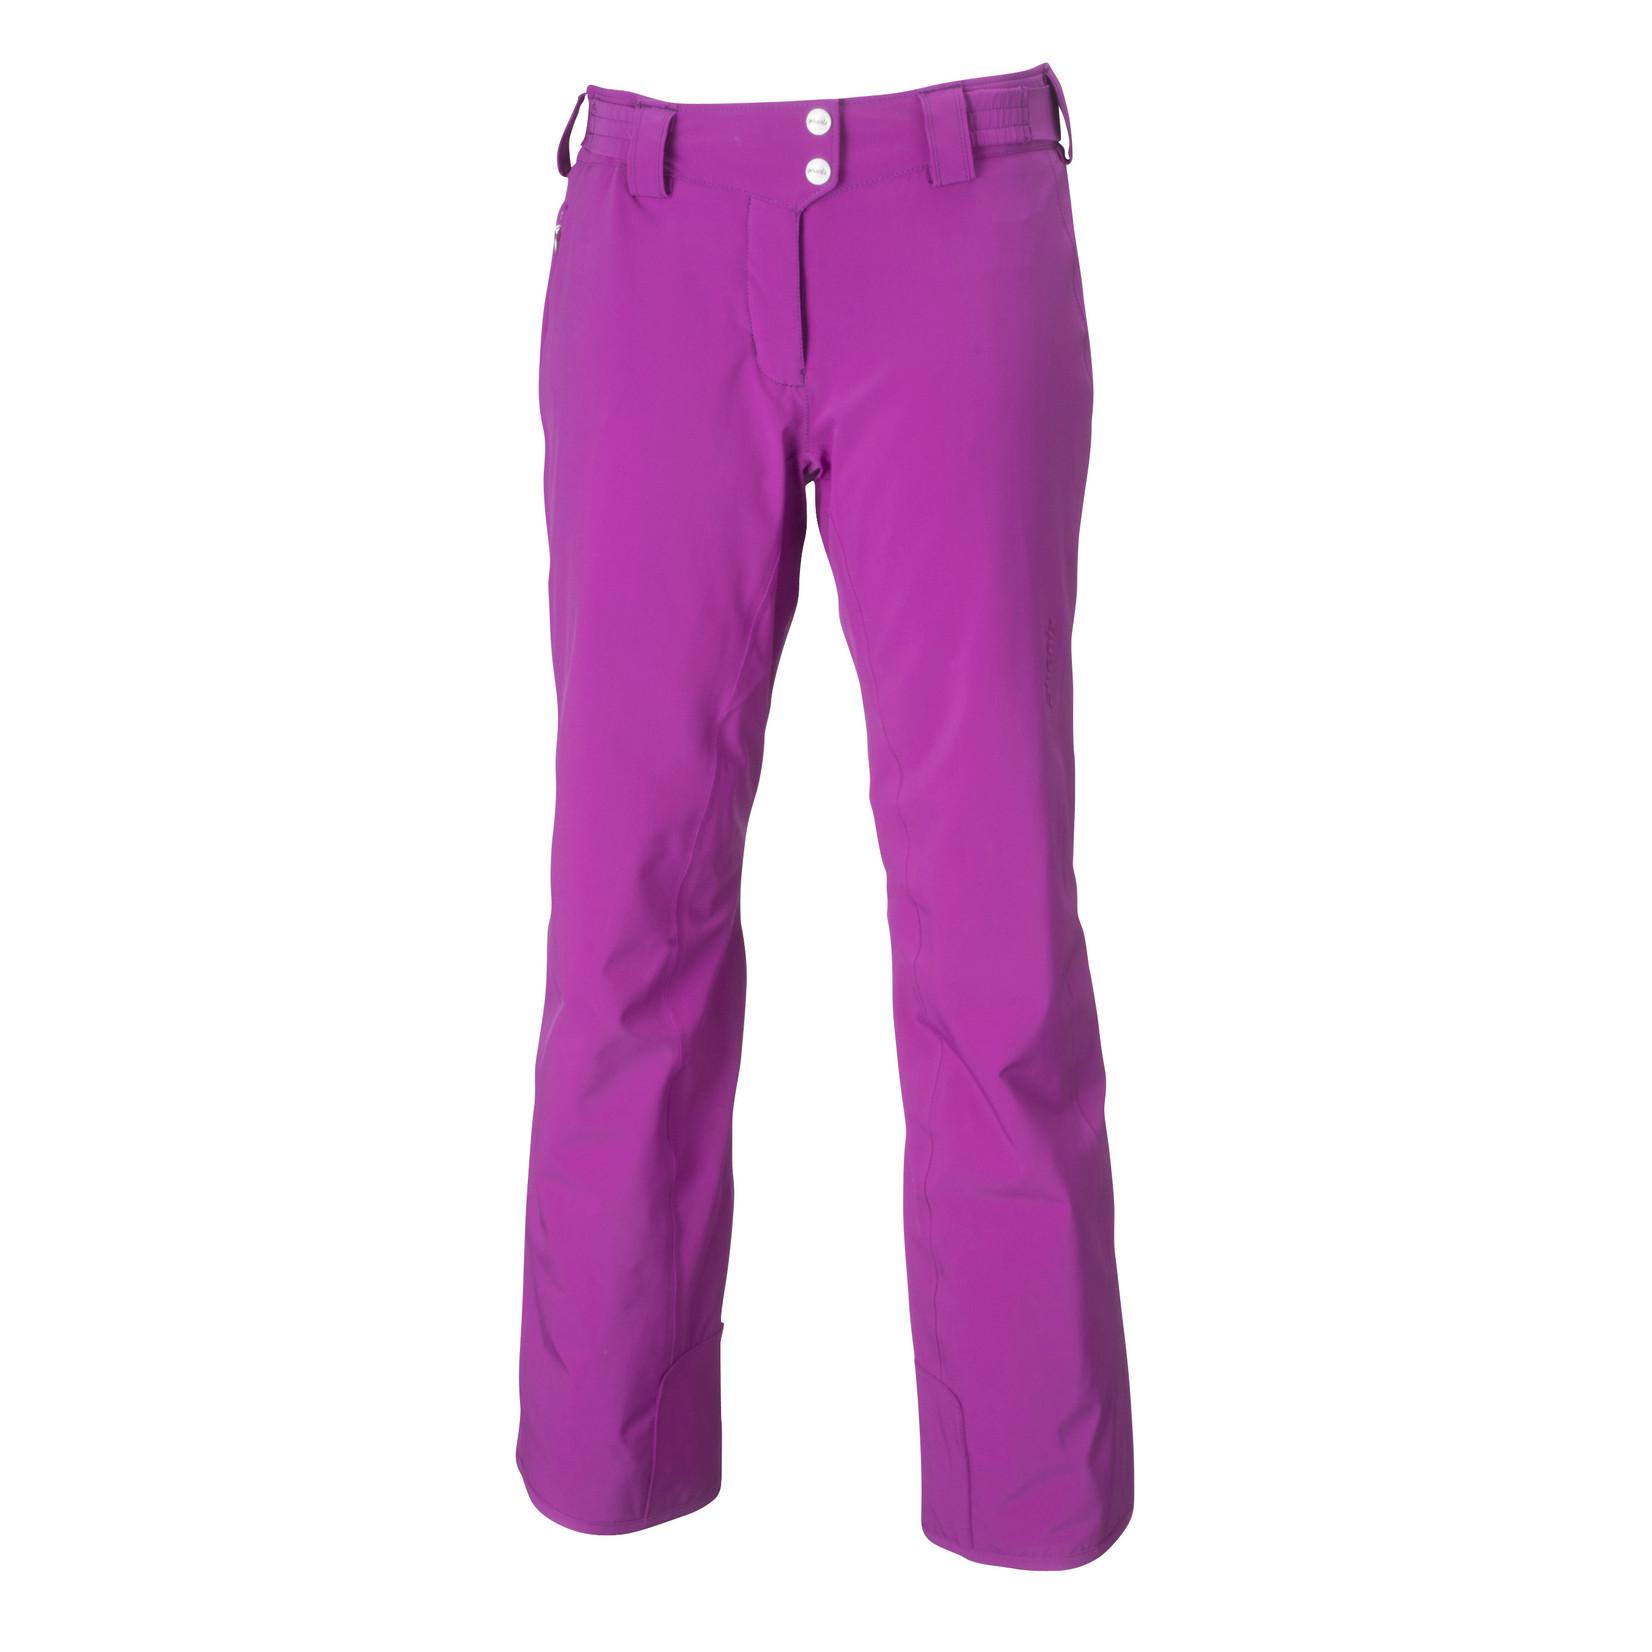 PHENIX Moonlight Waist Pants